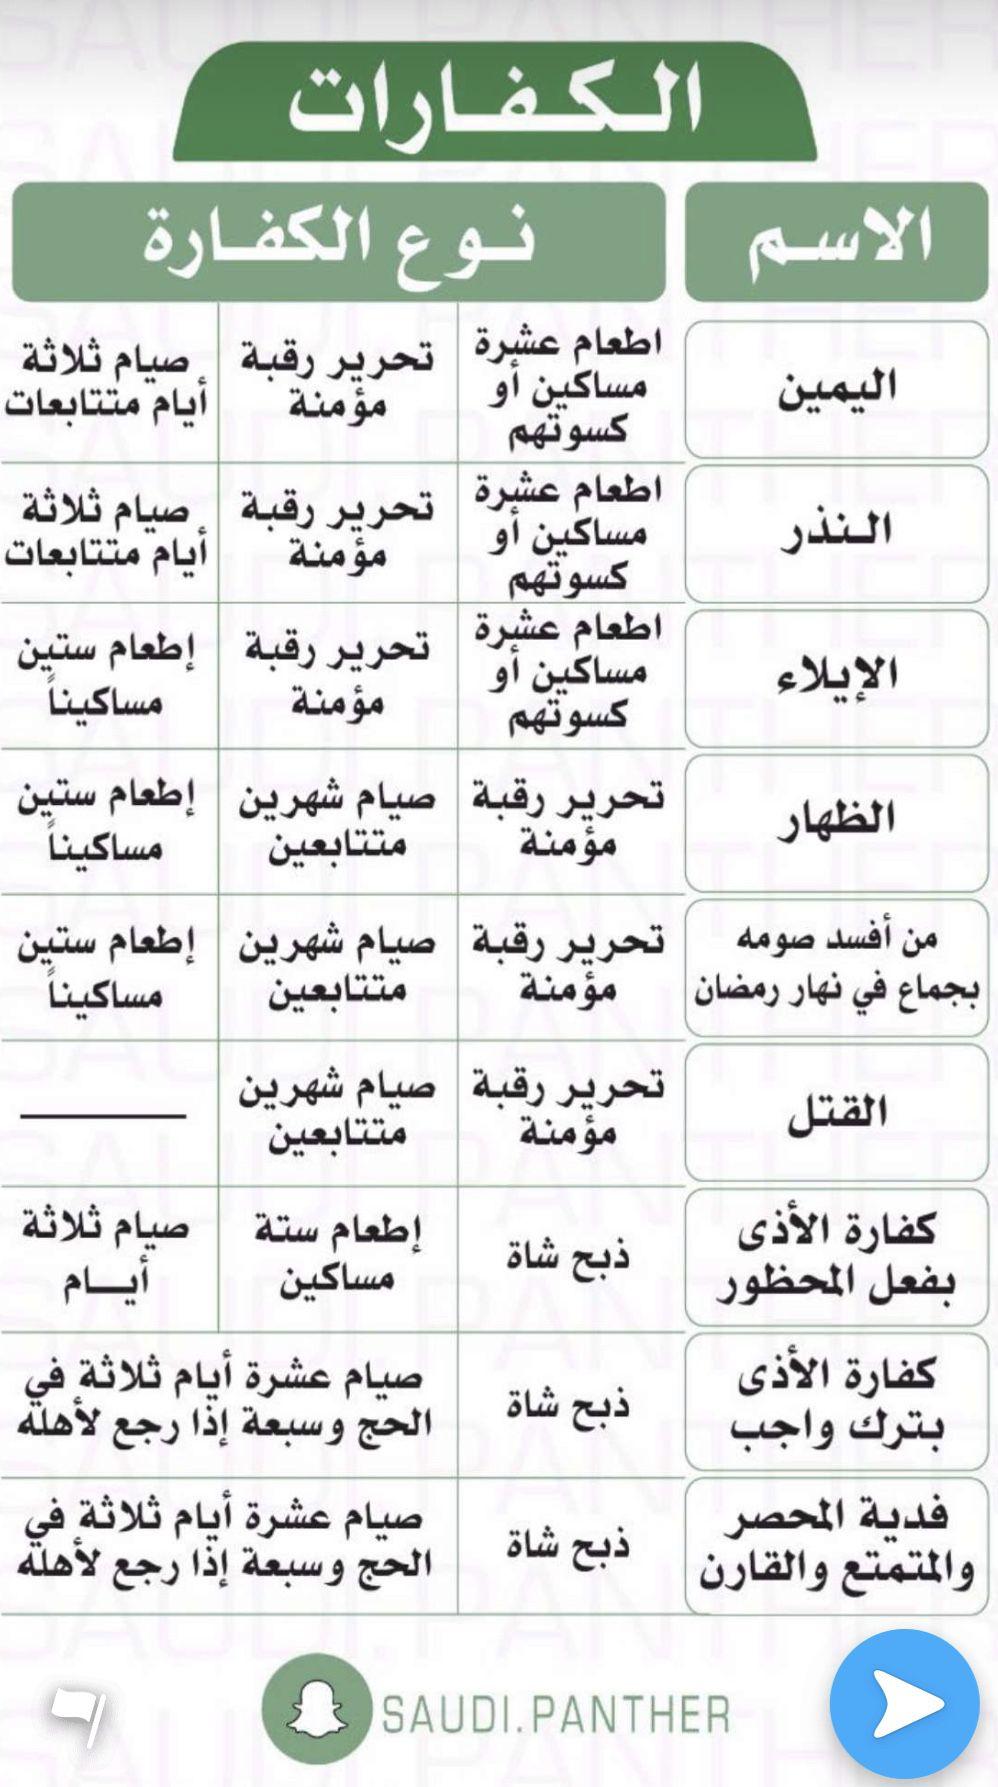 Pin By Habib Maaloul On Informations معلومات Islam Beliefs Islamic Inspirational Quotes Islam Facts